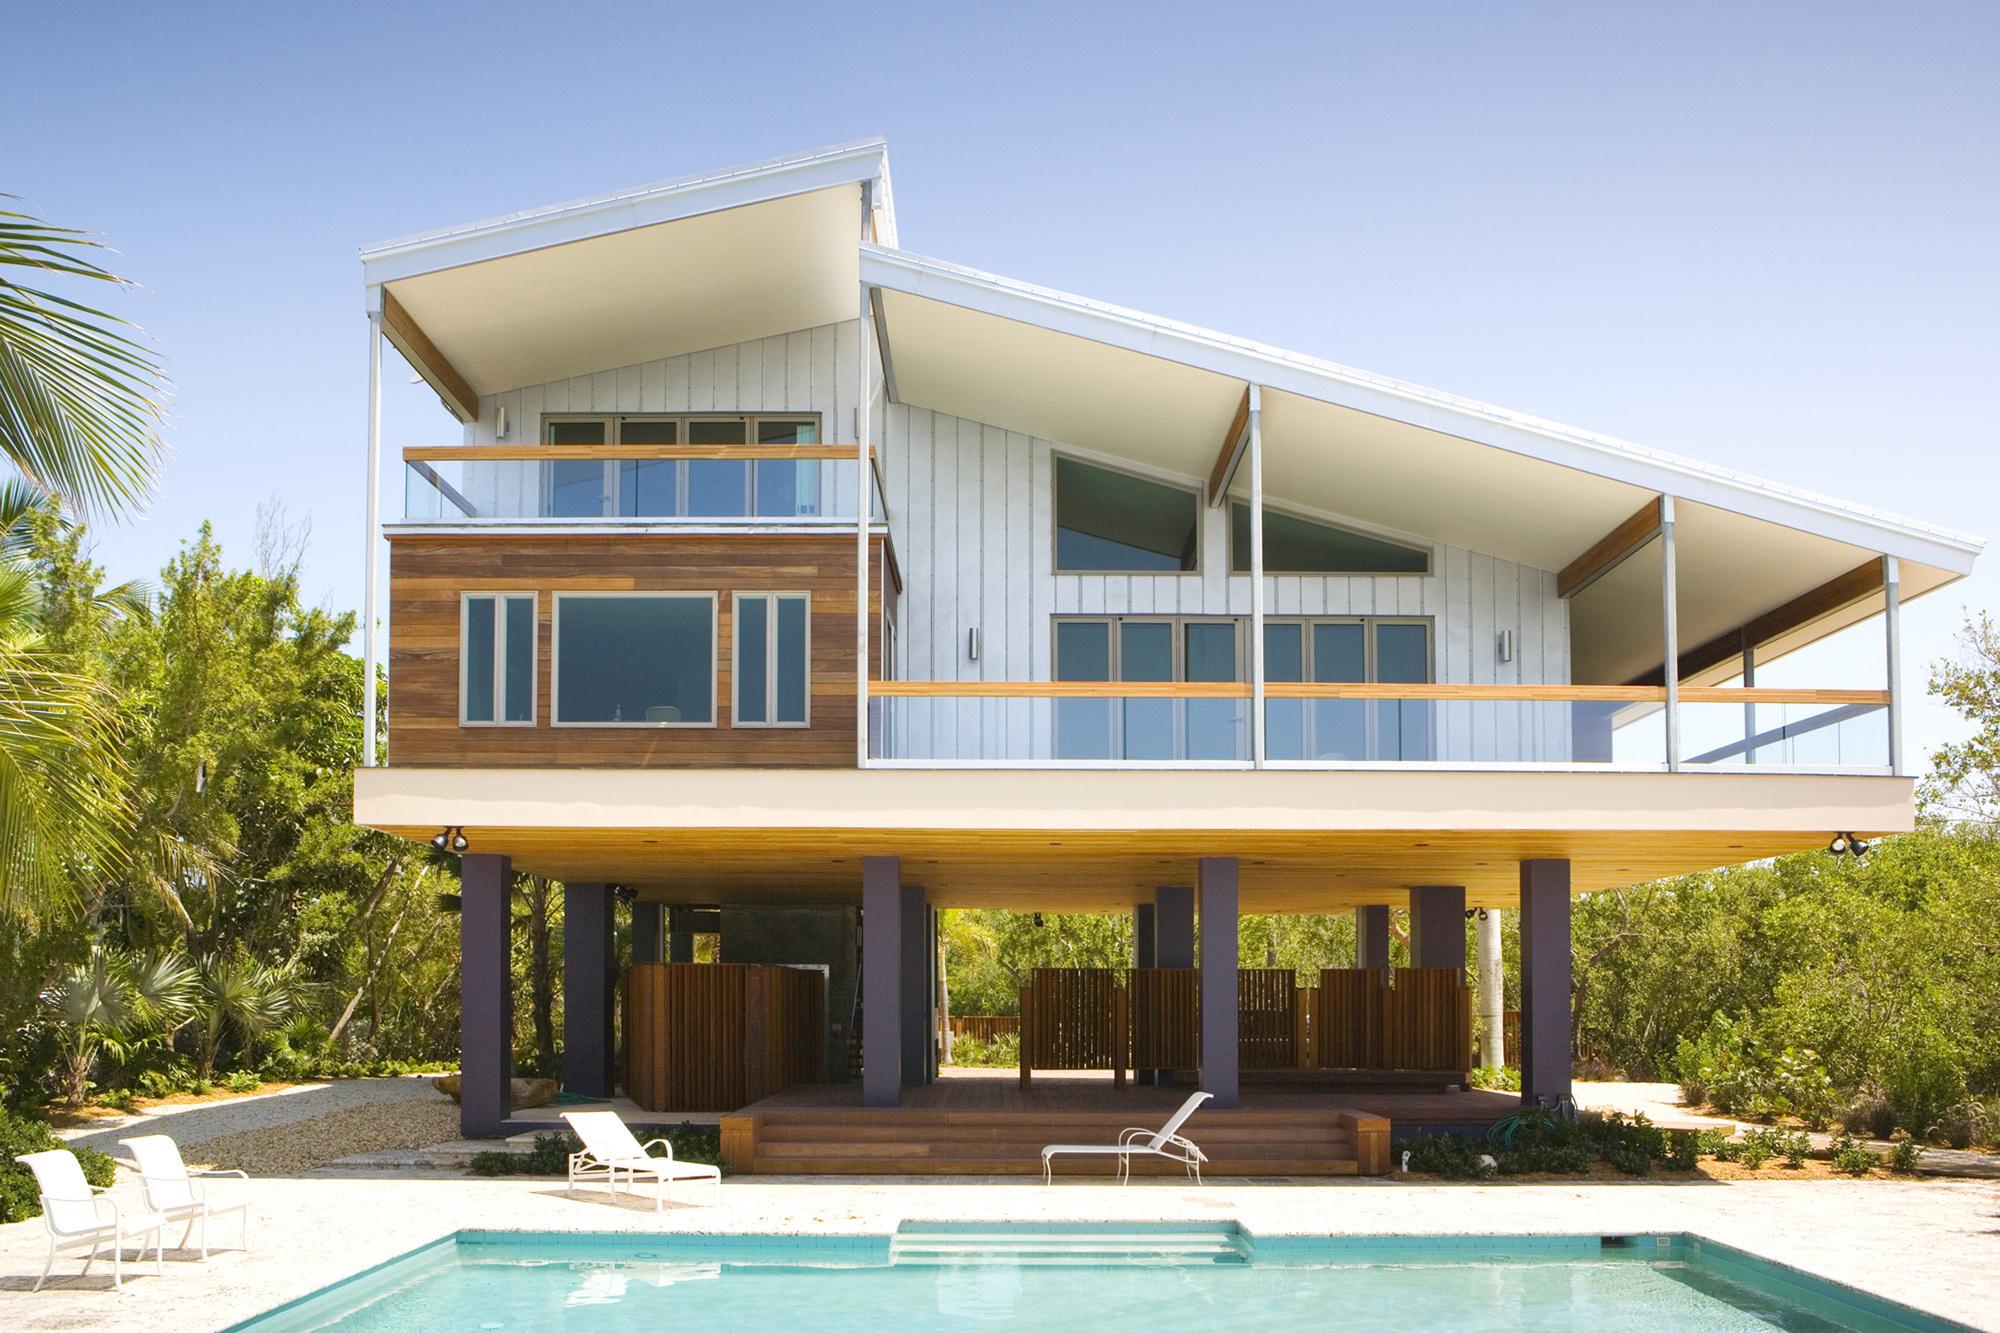 residencia-tavernier-drive-luis-pons-design-lab_eric_carle_060407_047